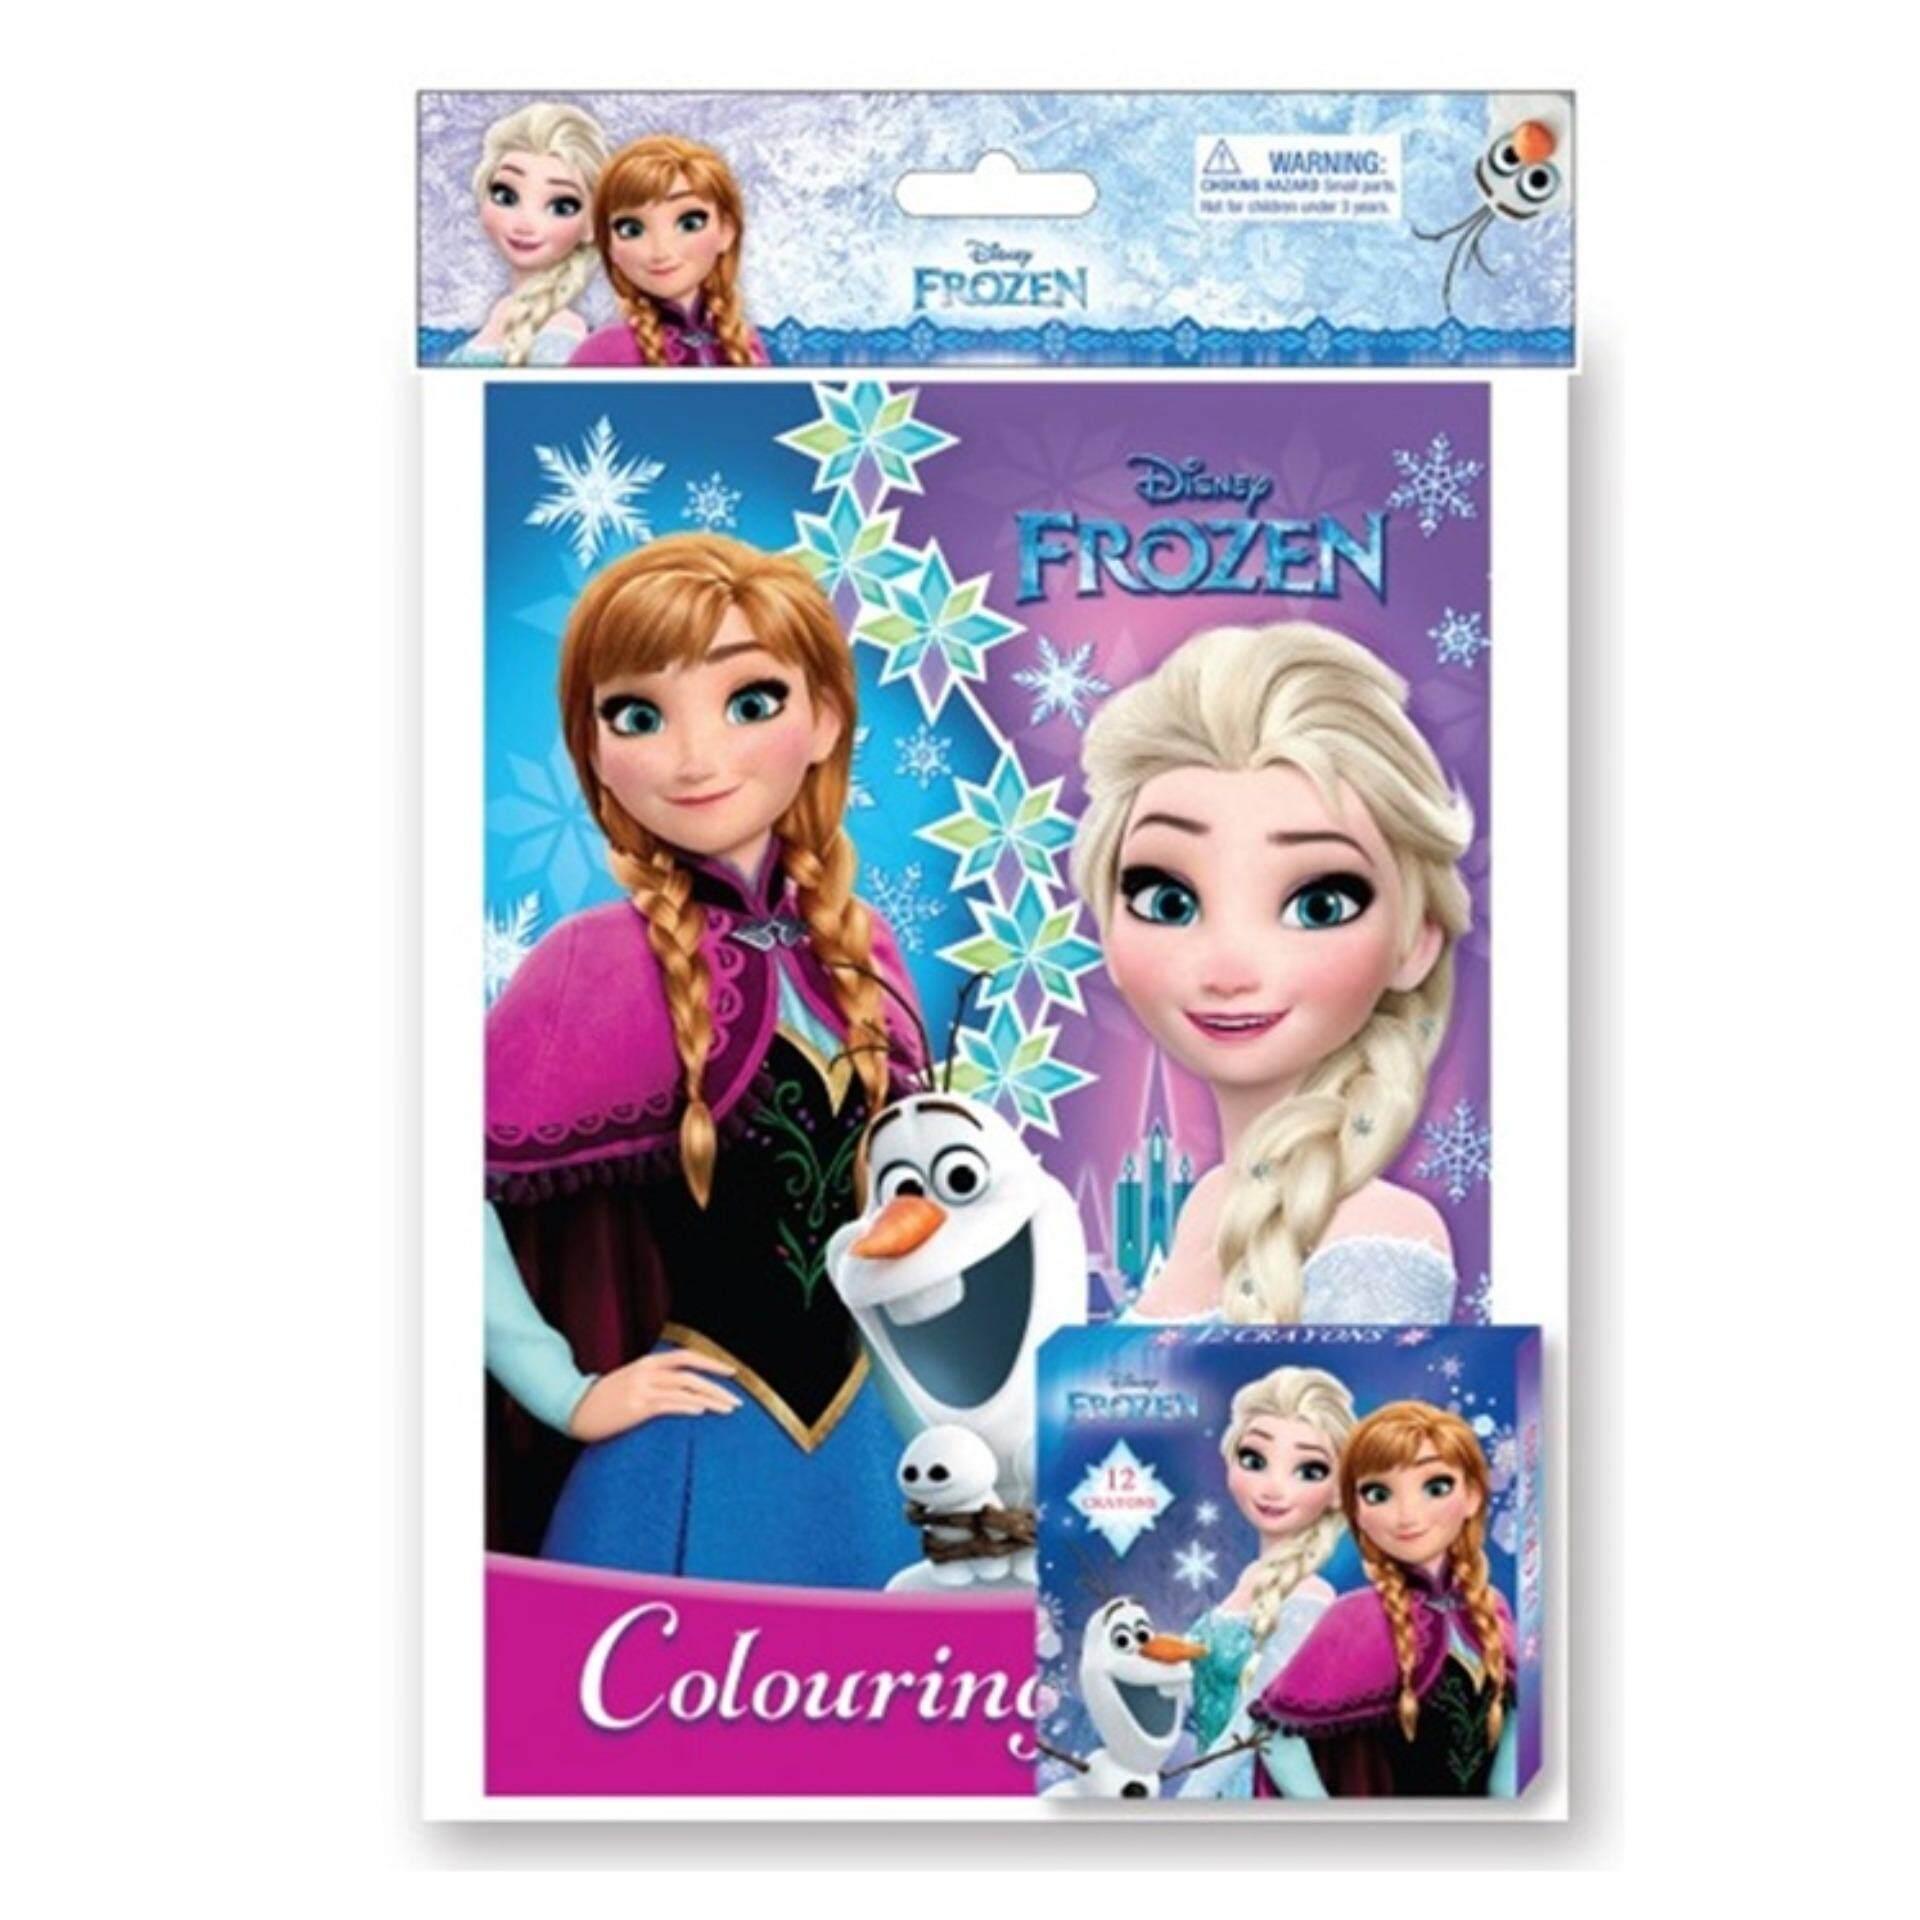 Disney Princess Frozen Activity And Colouring Book With 12pcs Crayon Set - Purple And Blue Colour